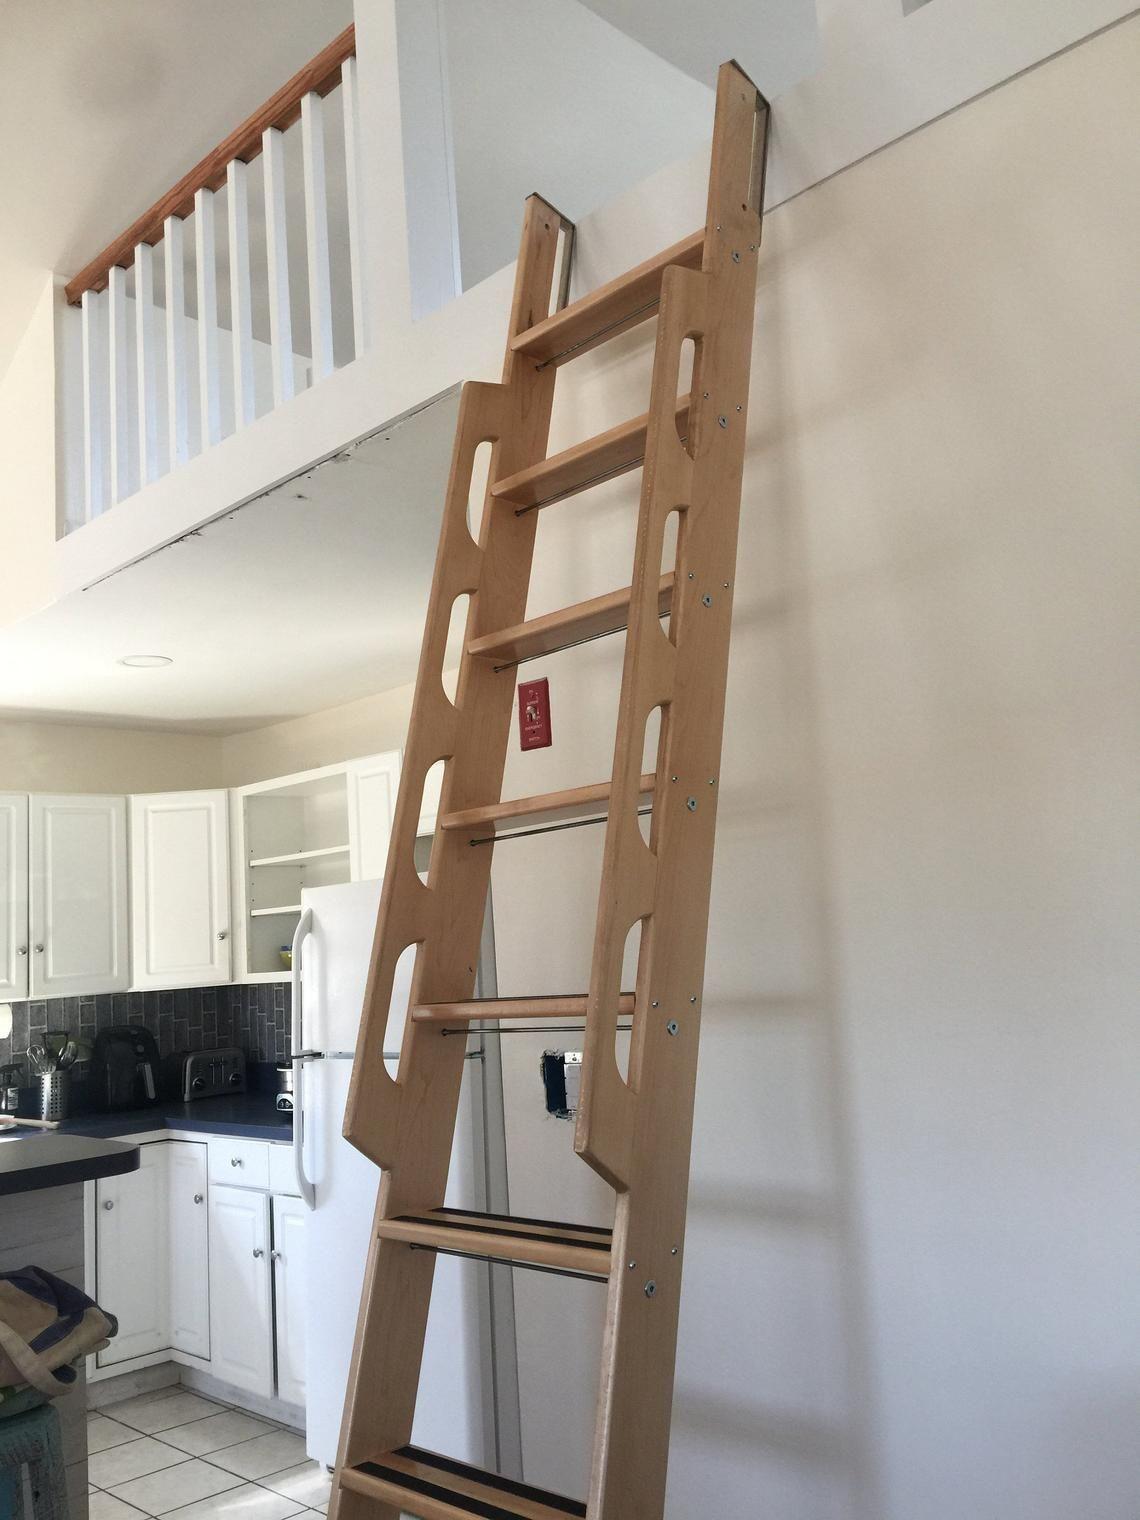 Image 0 Loft Ladder Ship Ladder Stair Ladder